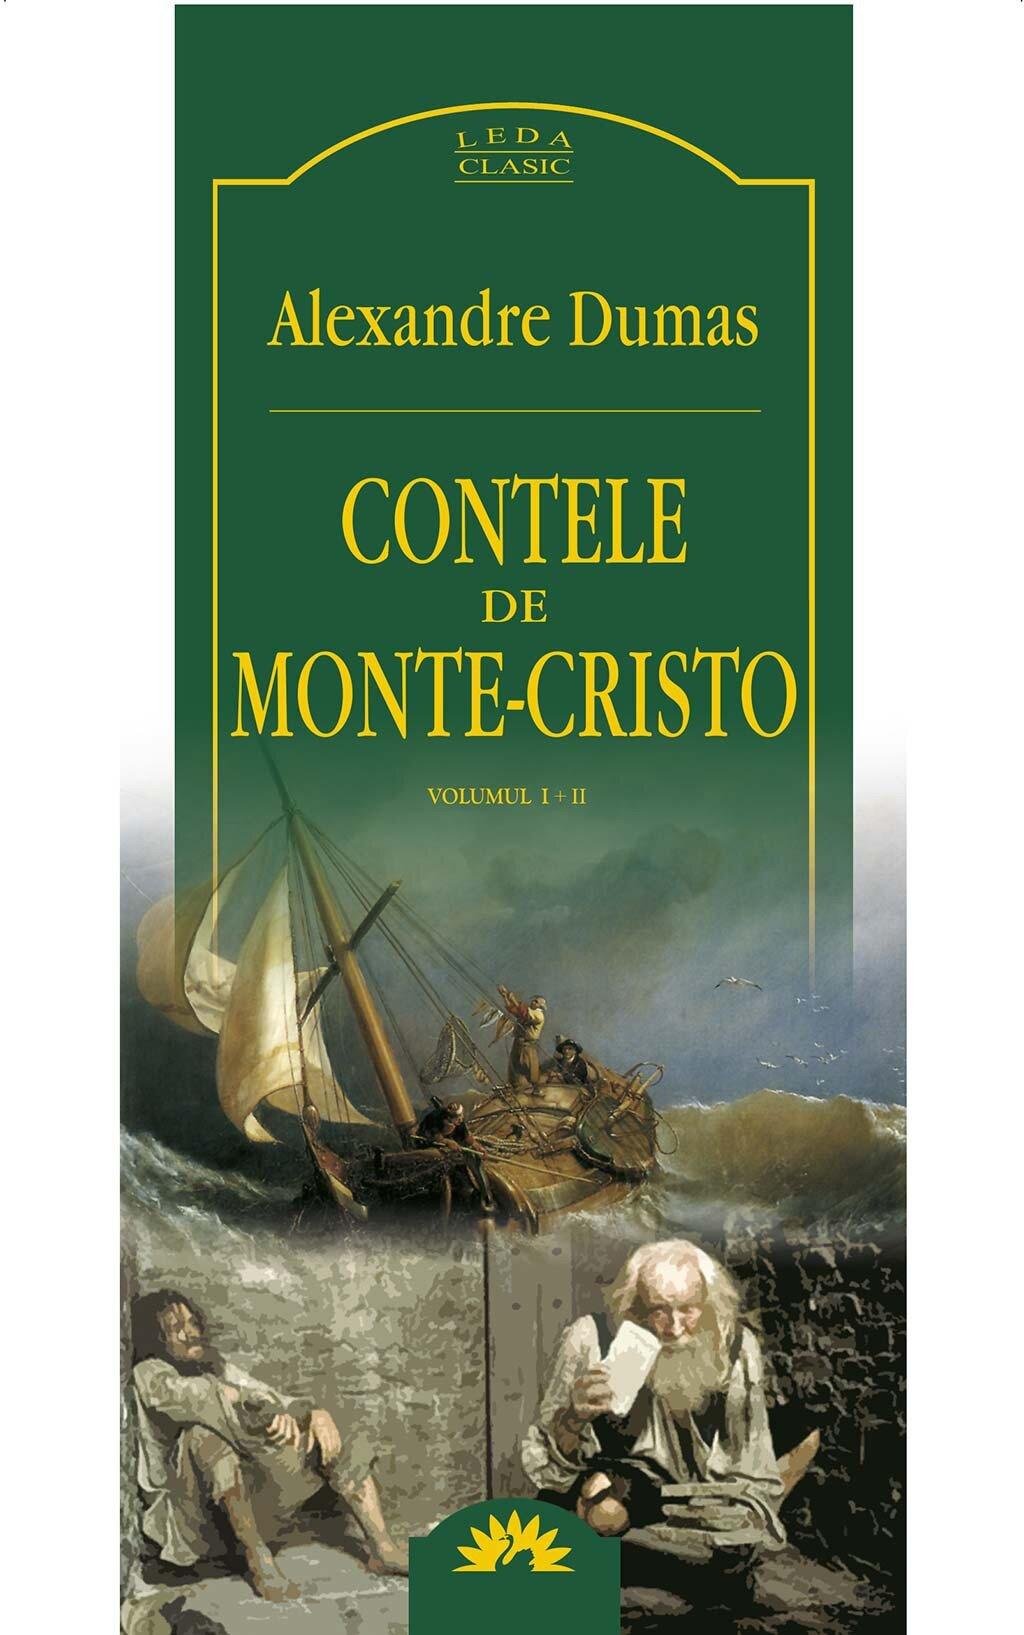 Contele de Monte-Cristo (eBook)